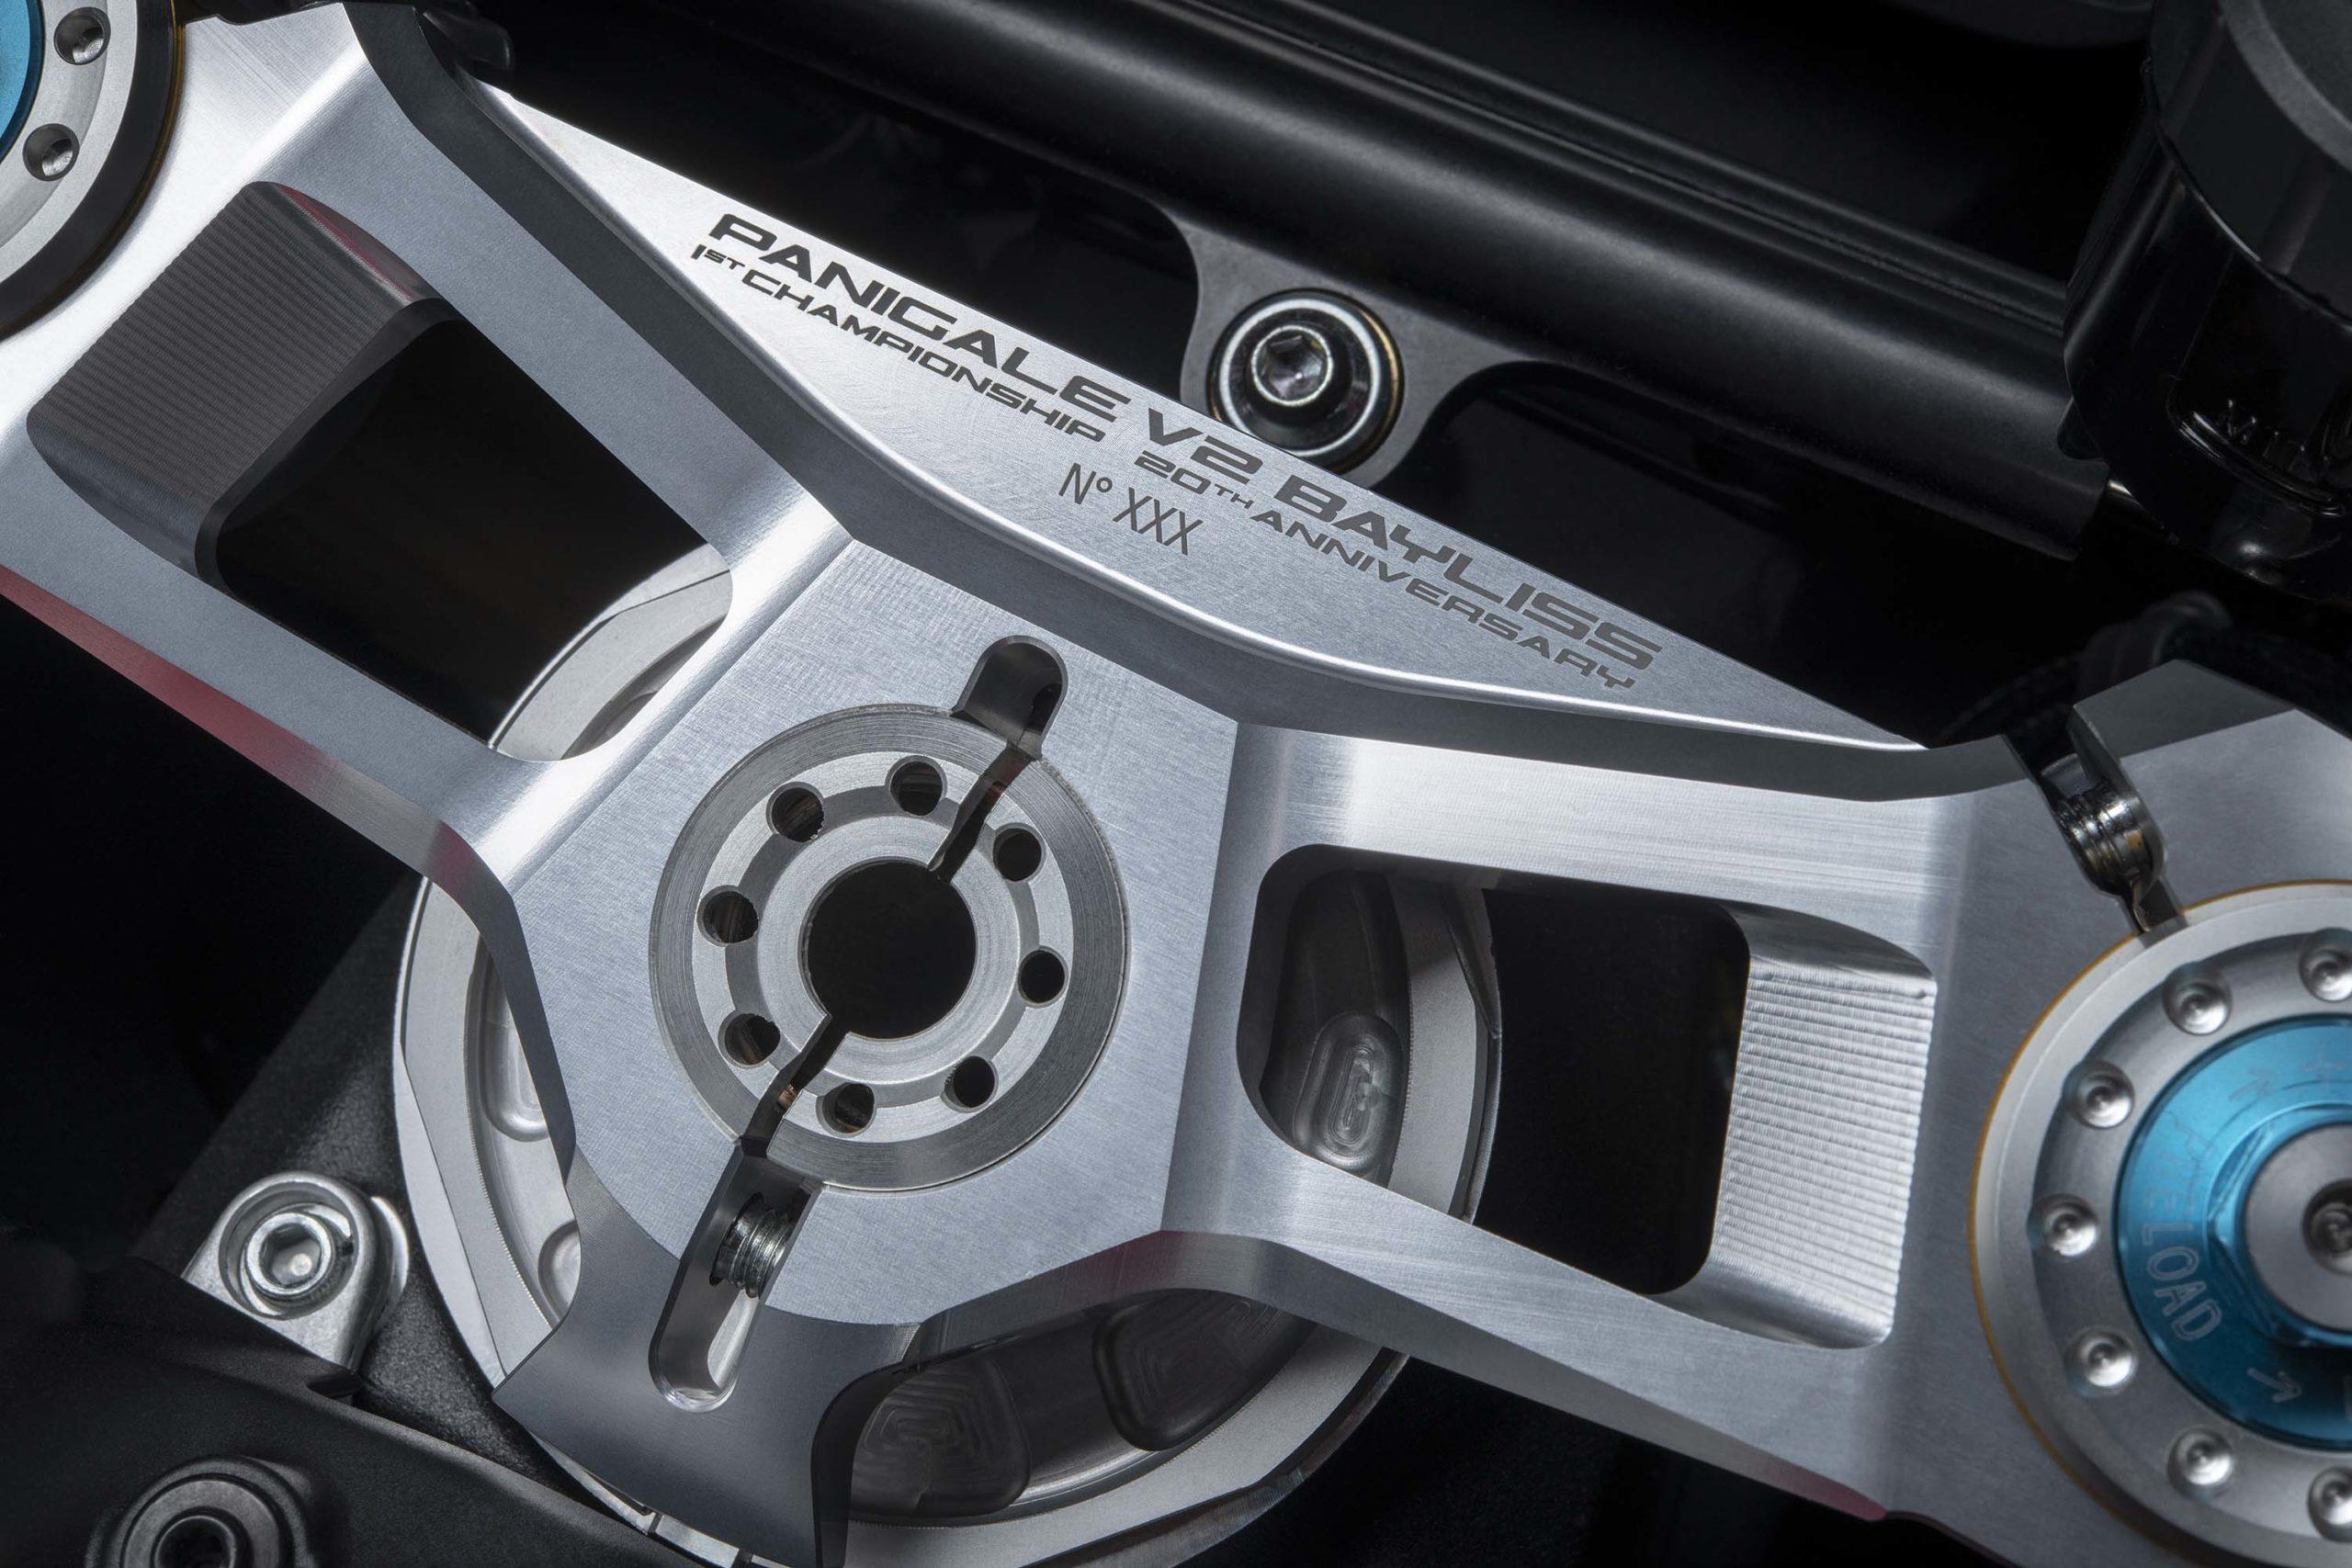 Ducati-Panigale-V4-Troy-Bayliss-16-scale